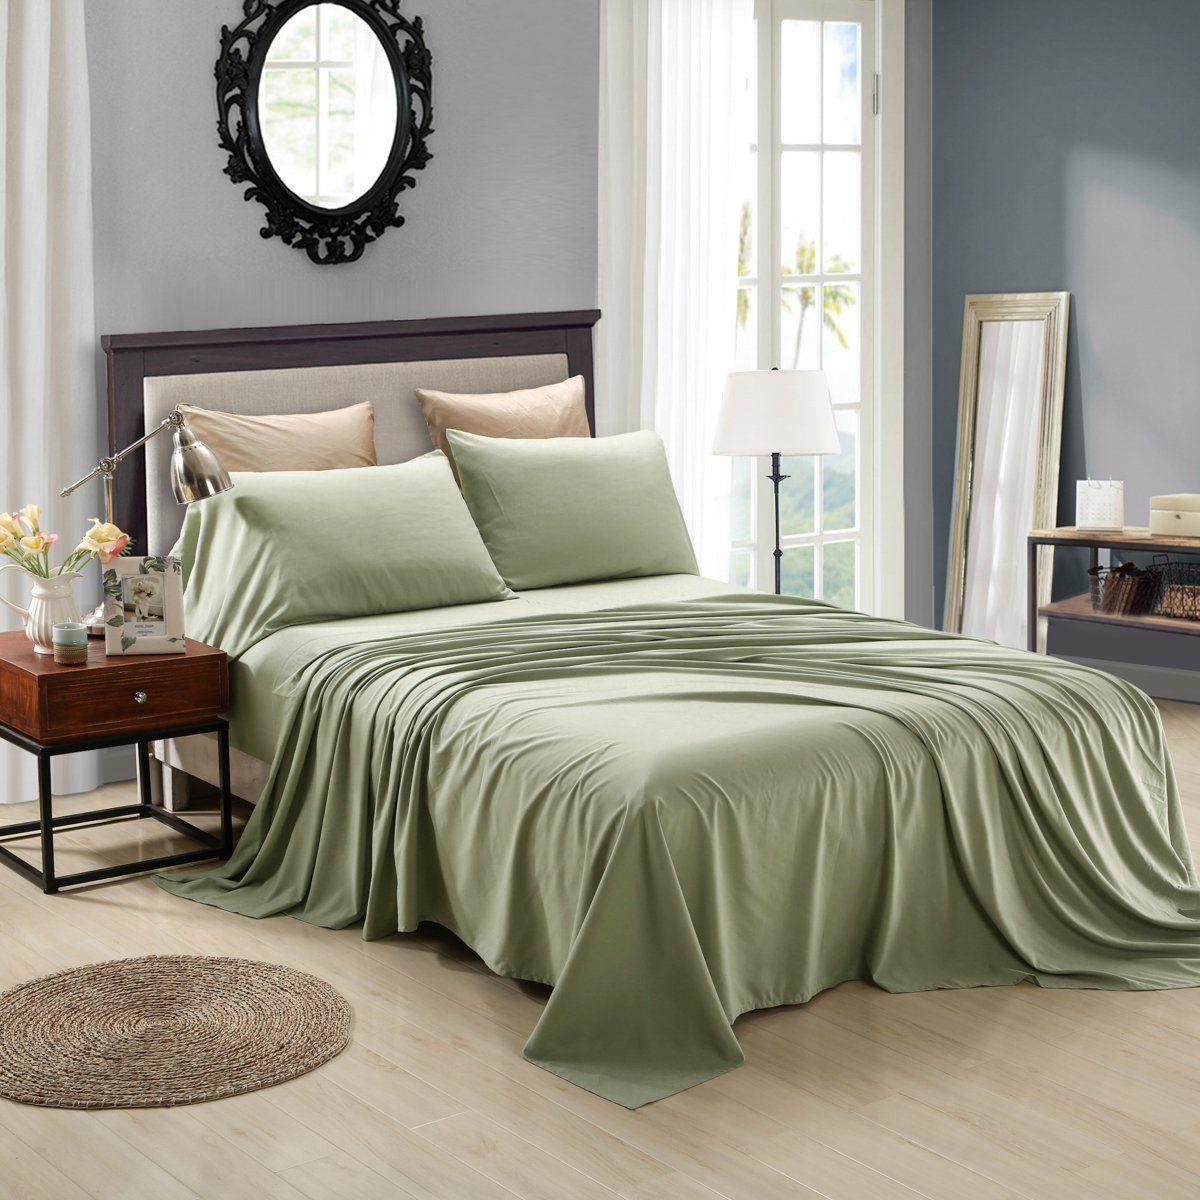 Superieur Honeymoon Extreme Soft 4PC Bed Sheet Set   Sage Green Sheet Set   $35.00